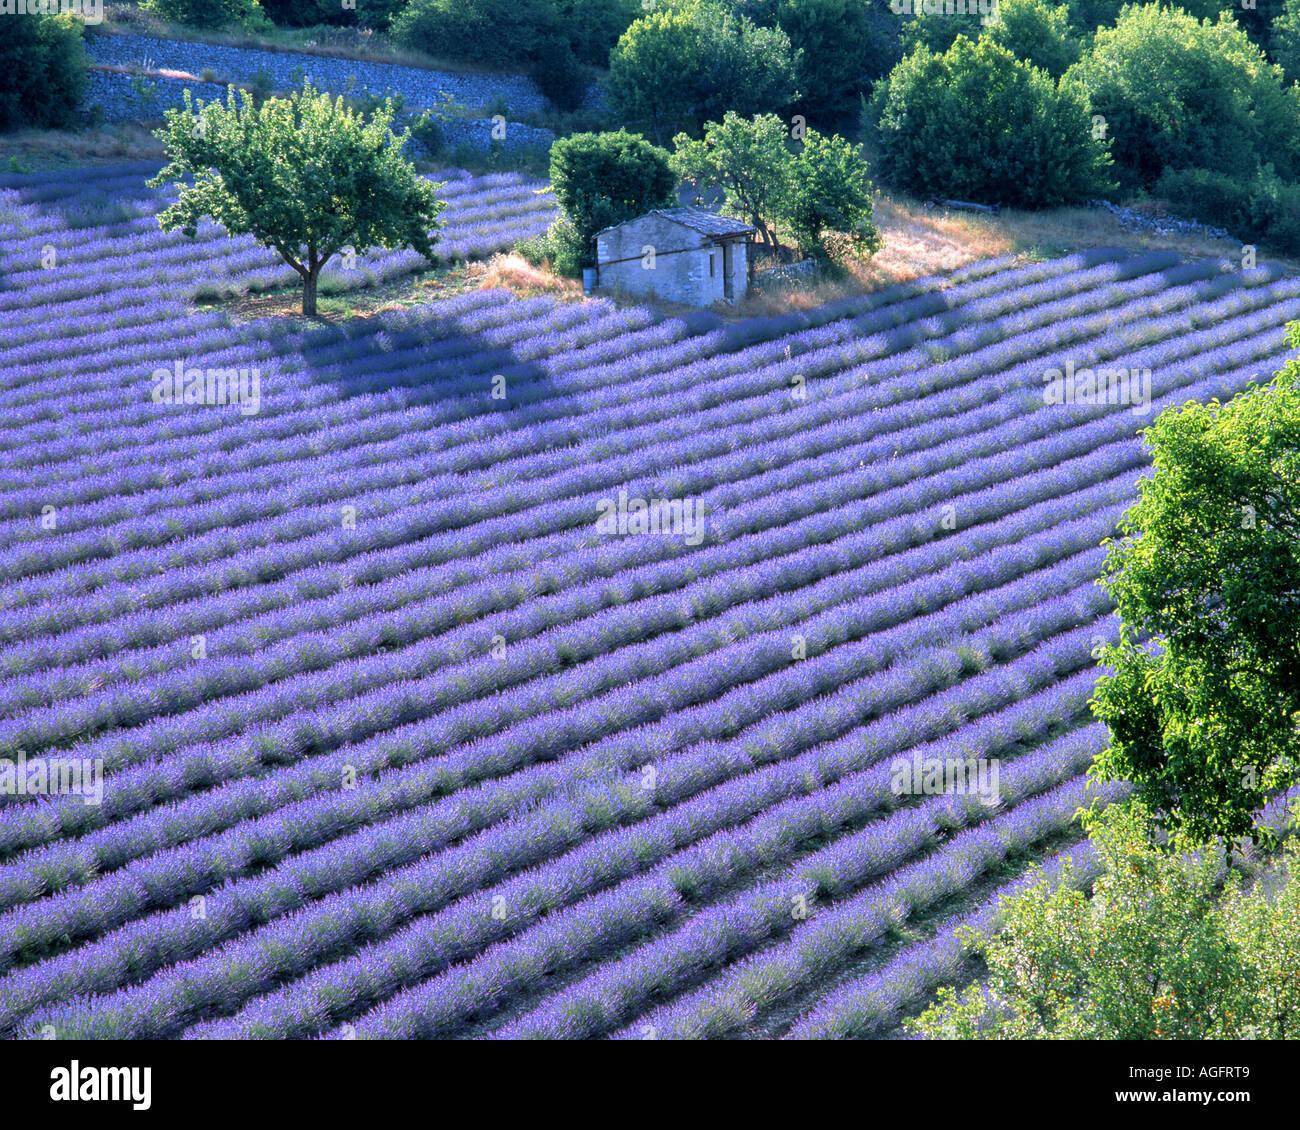 FR - PROVENCE: Lavender Field near Sault - Stock Image